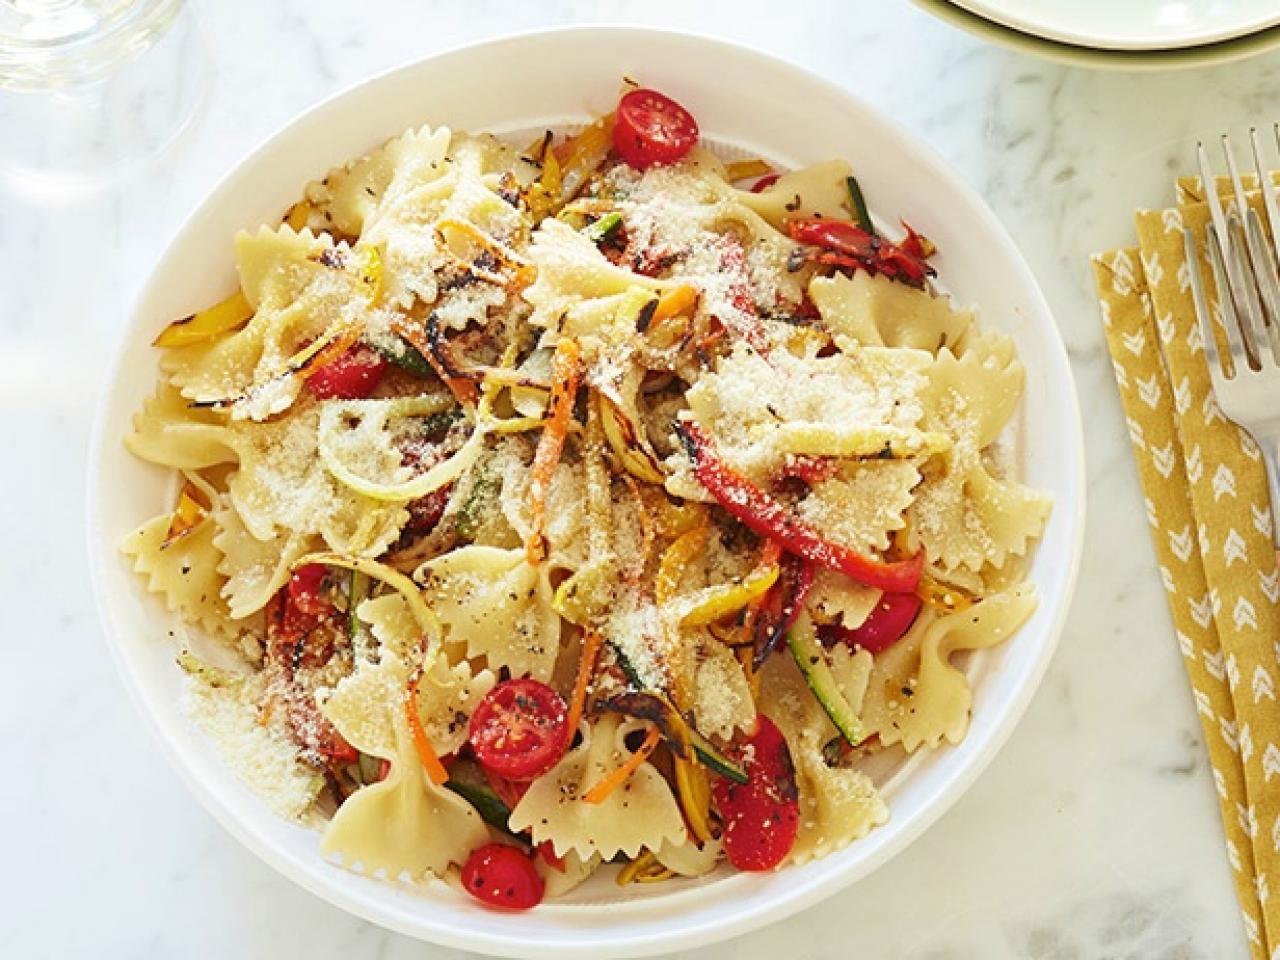 Giadas 10 best summer pasta recipes fn dish behind the scenes giadas 10 best summer pasta recipes forumfinder Choice Image